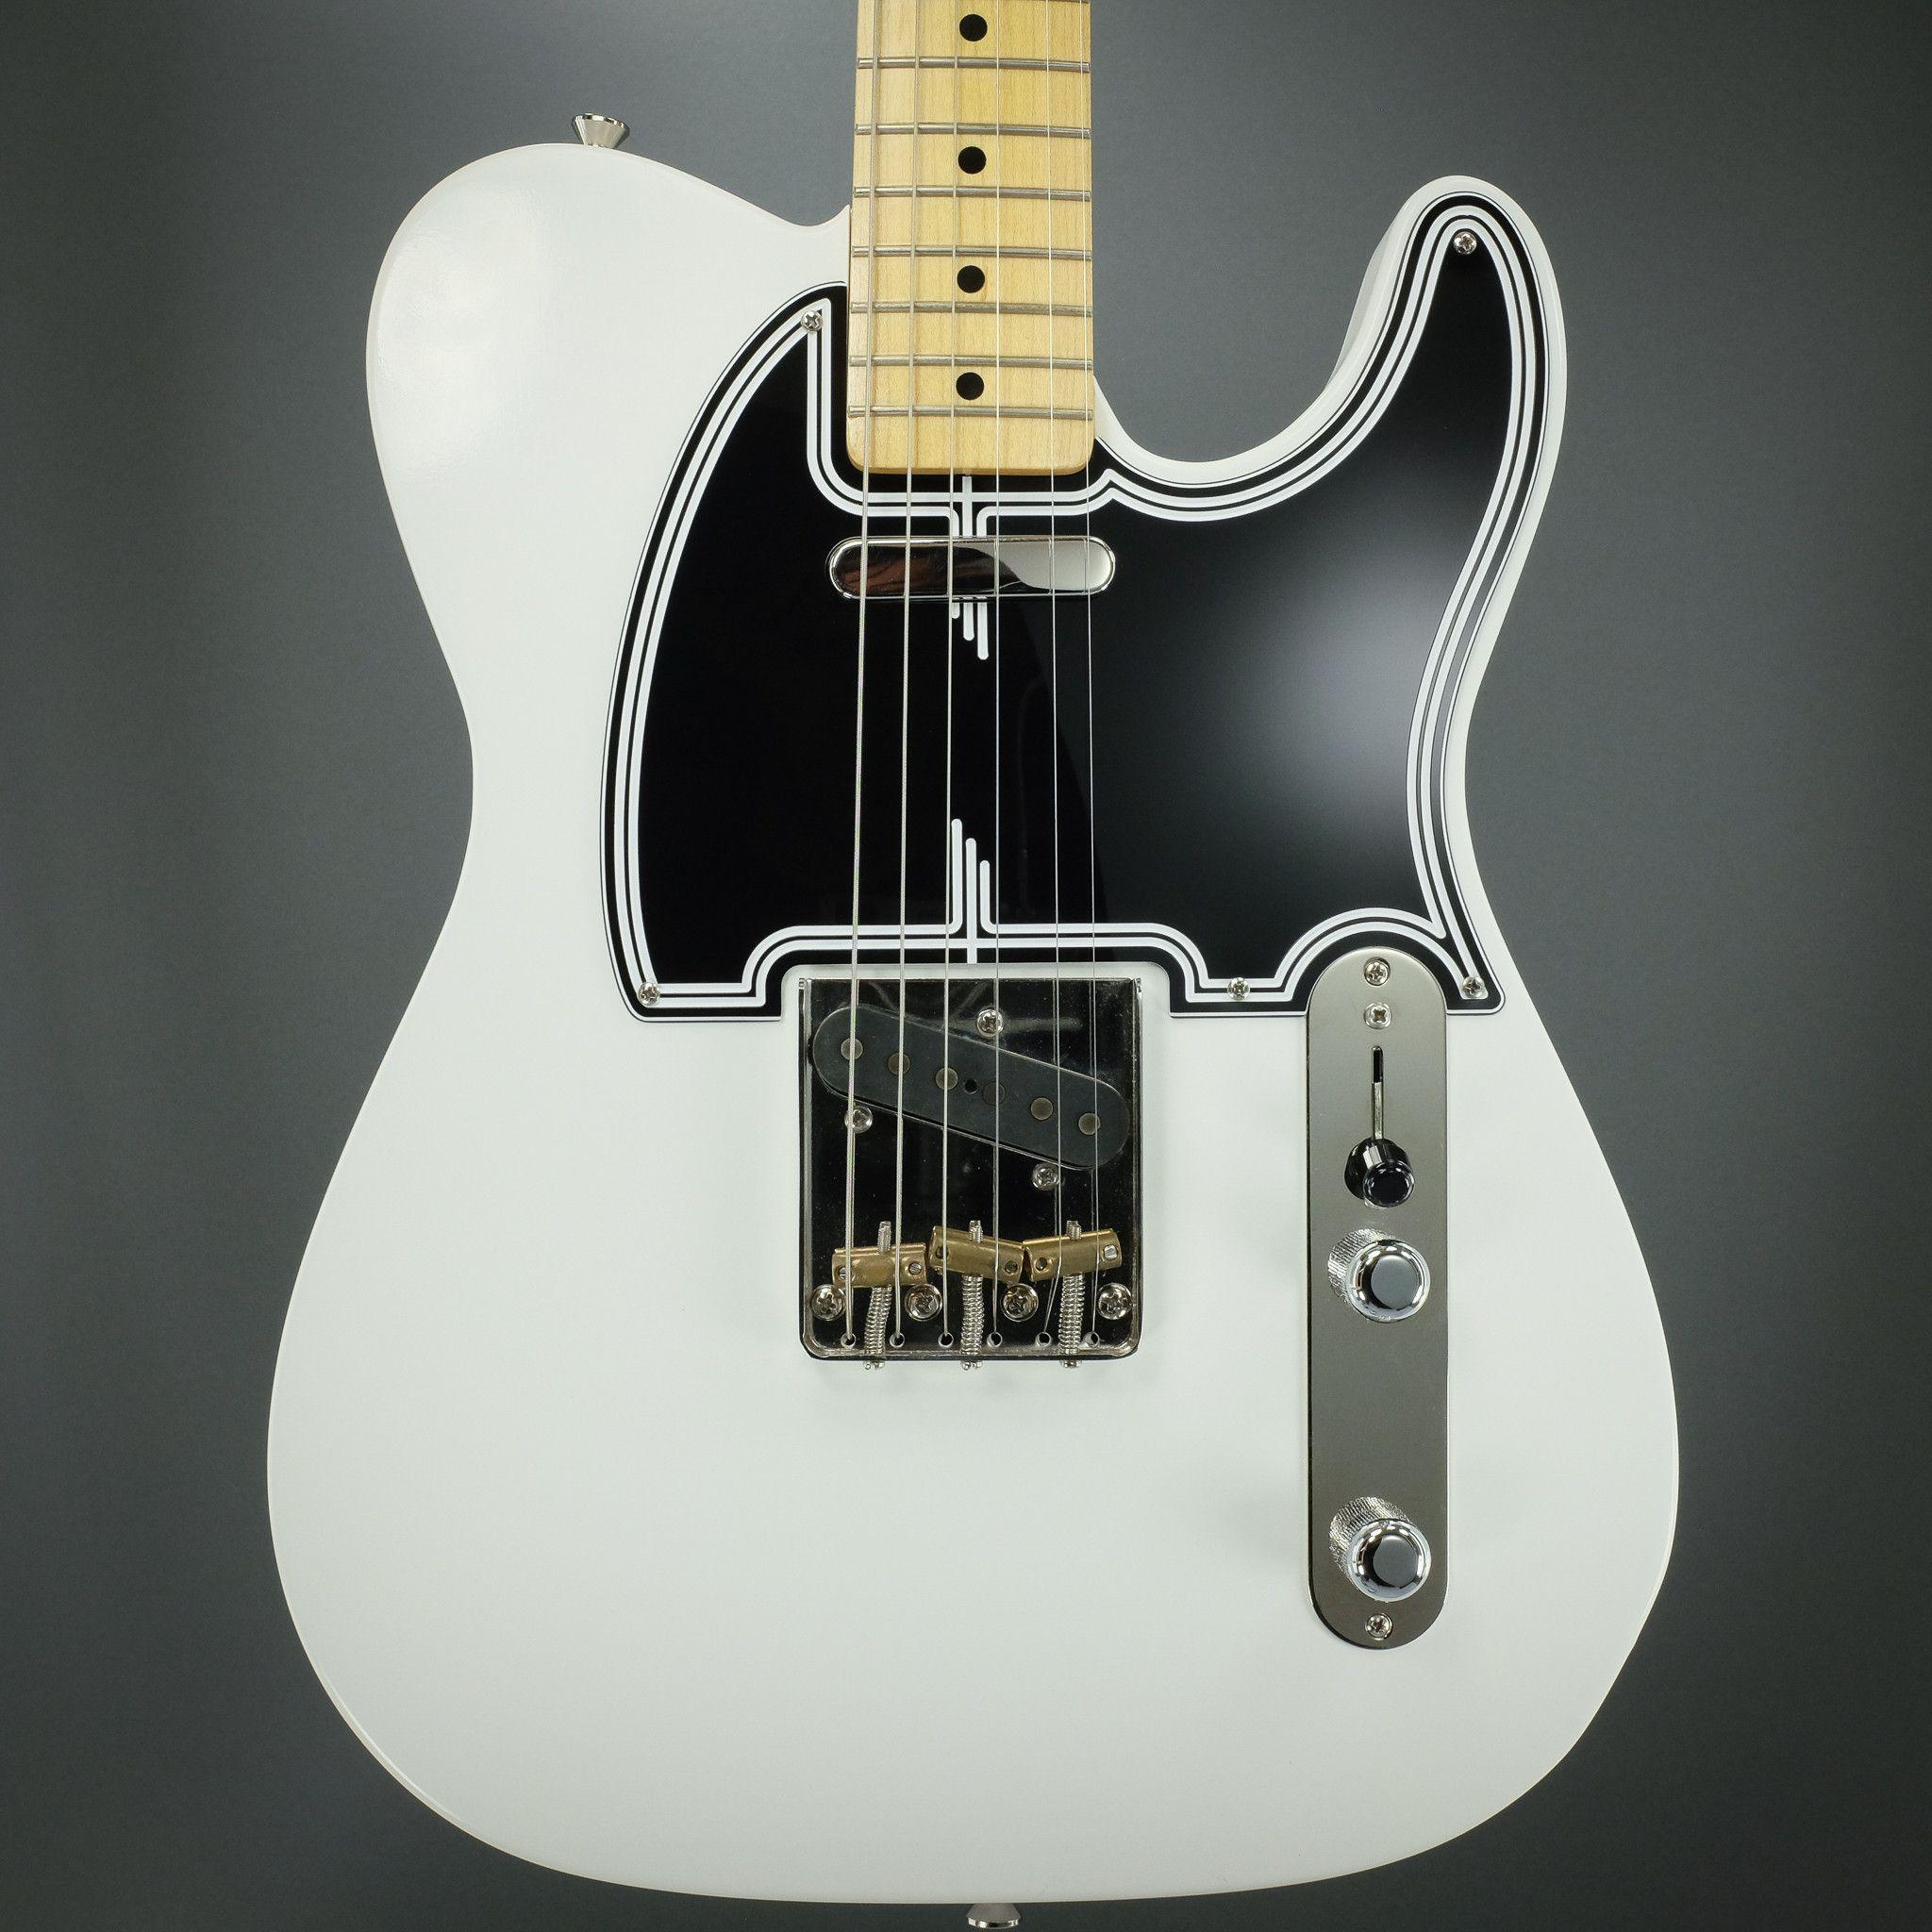 Streamline in 2019   Telecaster Dreamin'   Telecaster guitar, Guitar